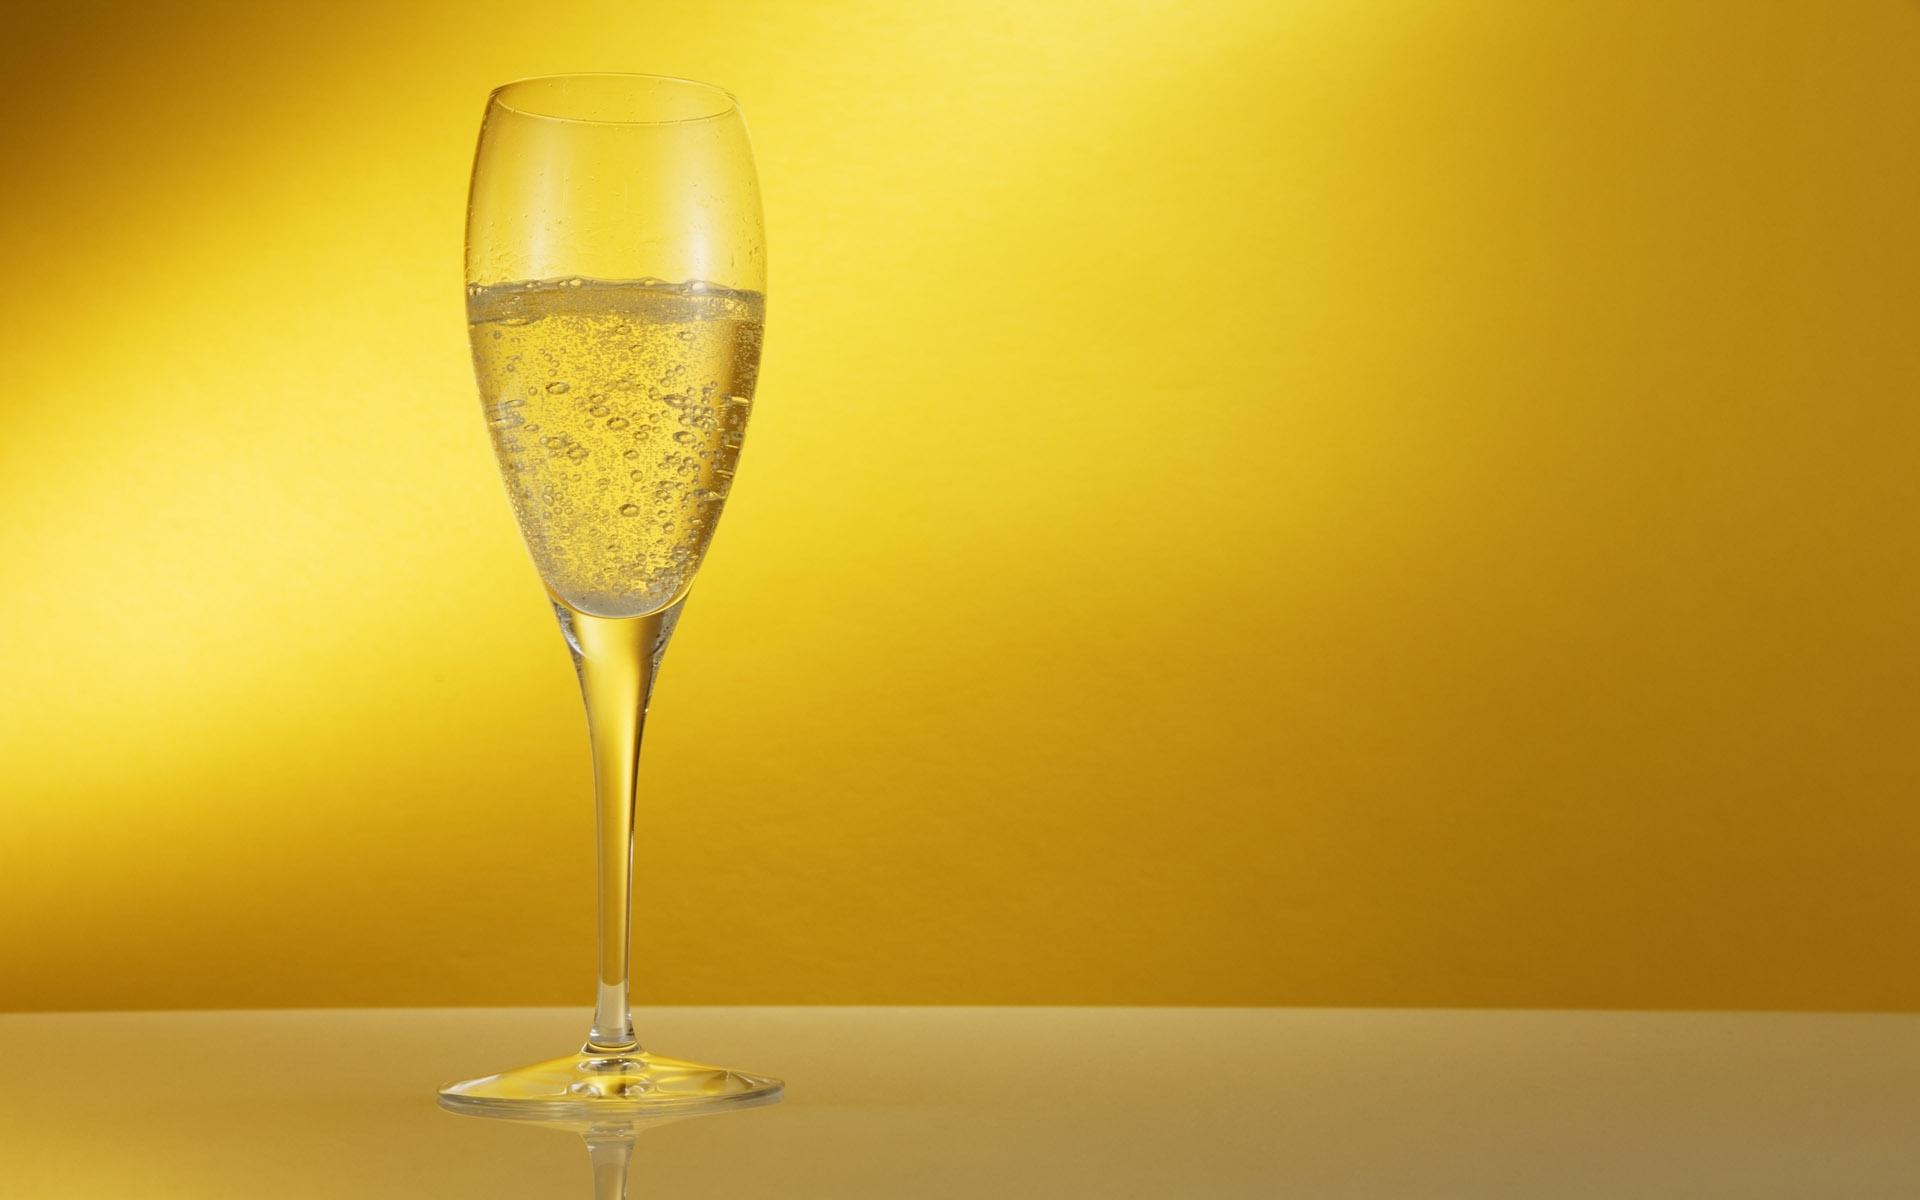 Вино - Wine 2 (65 обоев) » Смотри Красивые ...: lookw.ru/eda/page,3,169-vino-wine-2-65-oboev.html